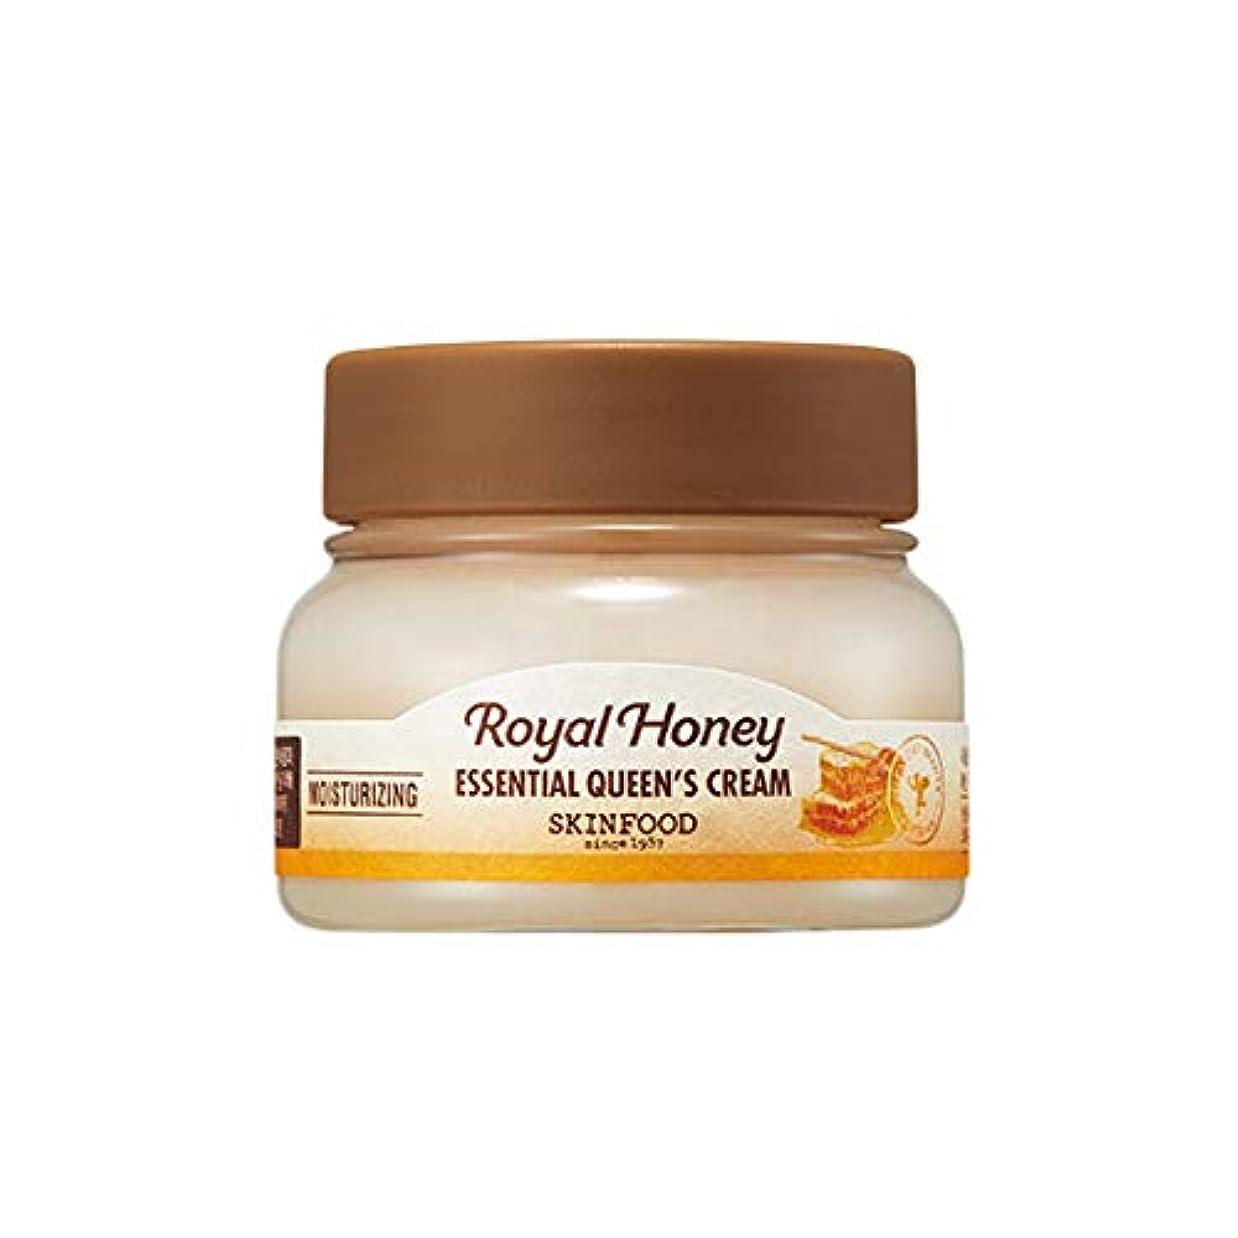 Skinfood ロイヤルハニーエッセンシャルクイーンクリーム/Royal Honey Essential Queen's Cream 62ml [並行輸入品]